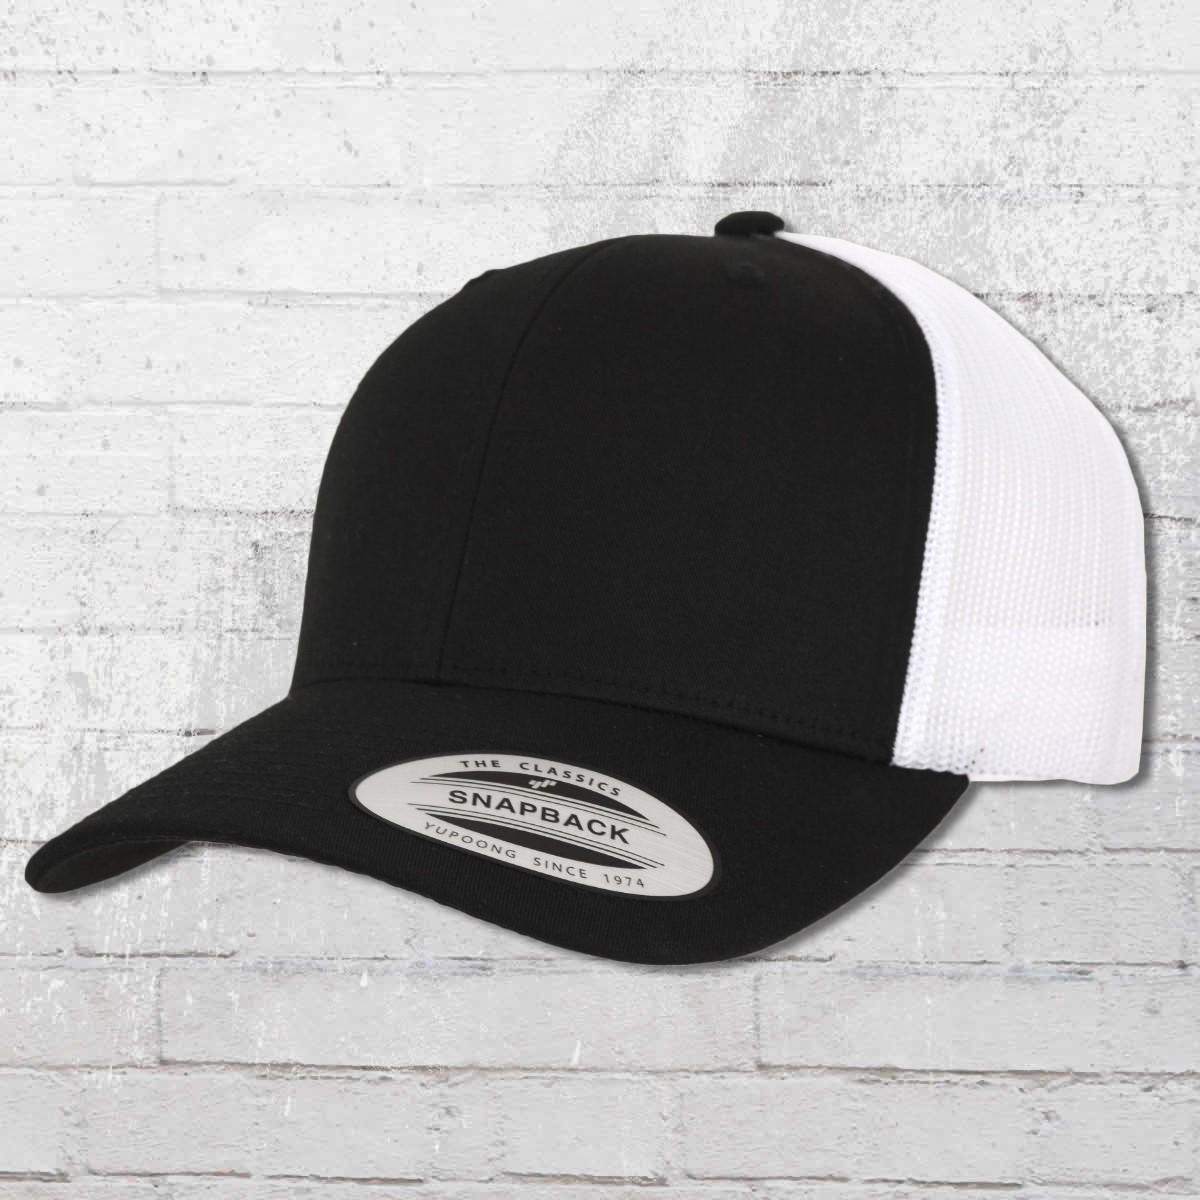 Yupoong by Flexfit Hat Retro Trucker Cap Snapback black white. ›‹ « 9718586c7fff